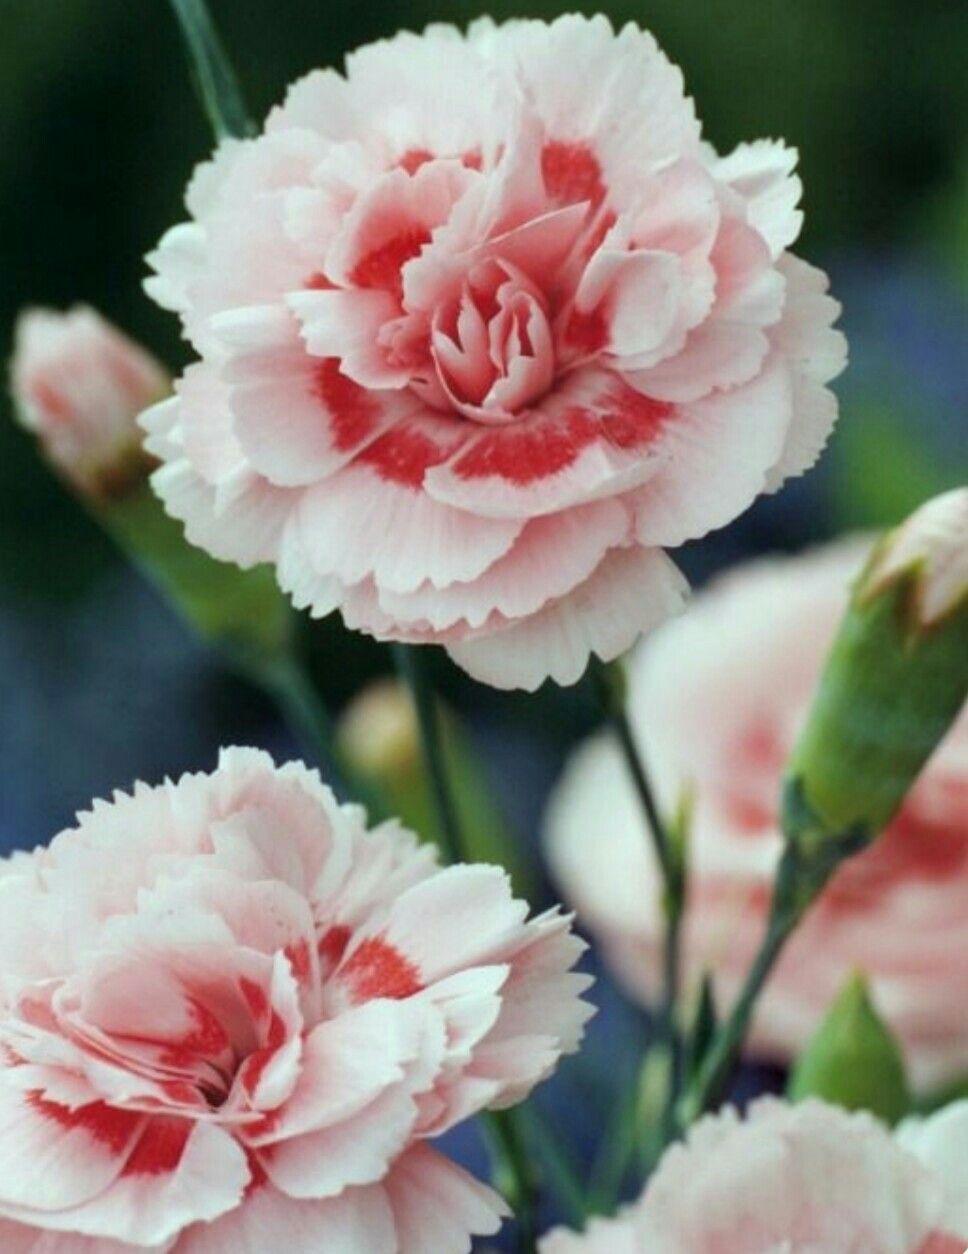 Pin By Amanda Bailey On Gardening Carnation Flower Beautiful Flowers Flowers